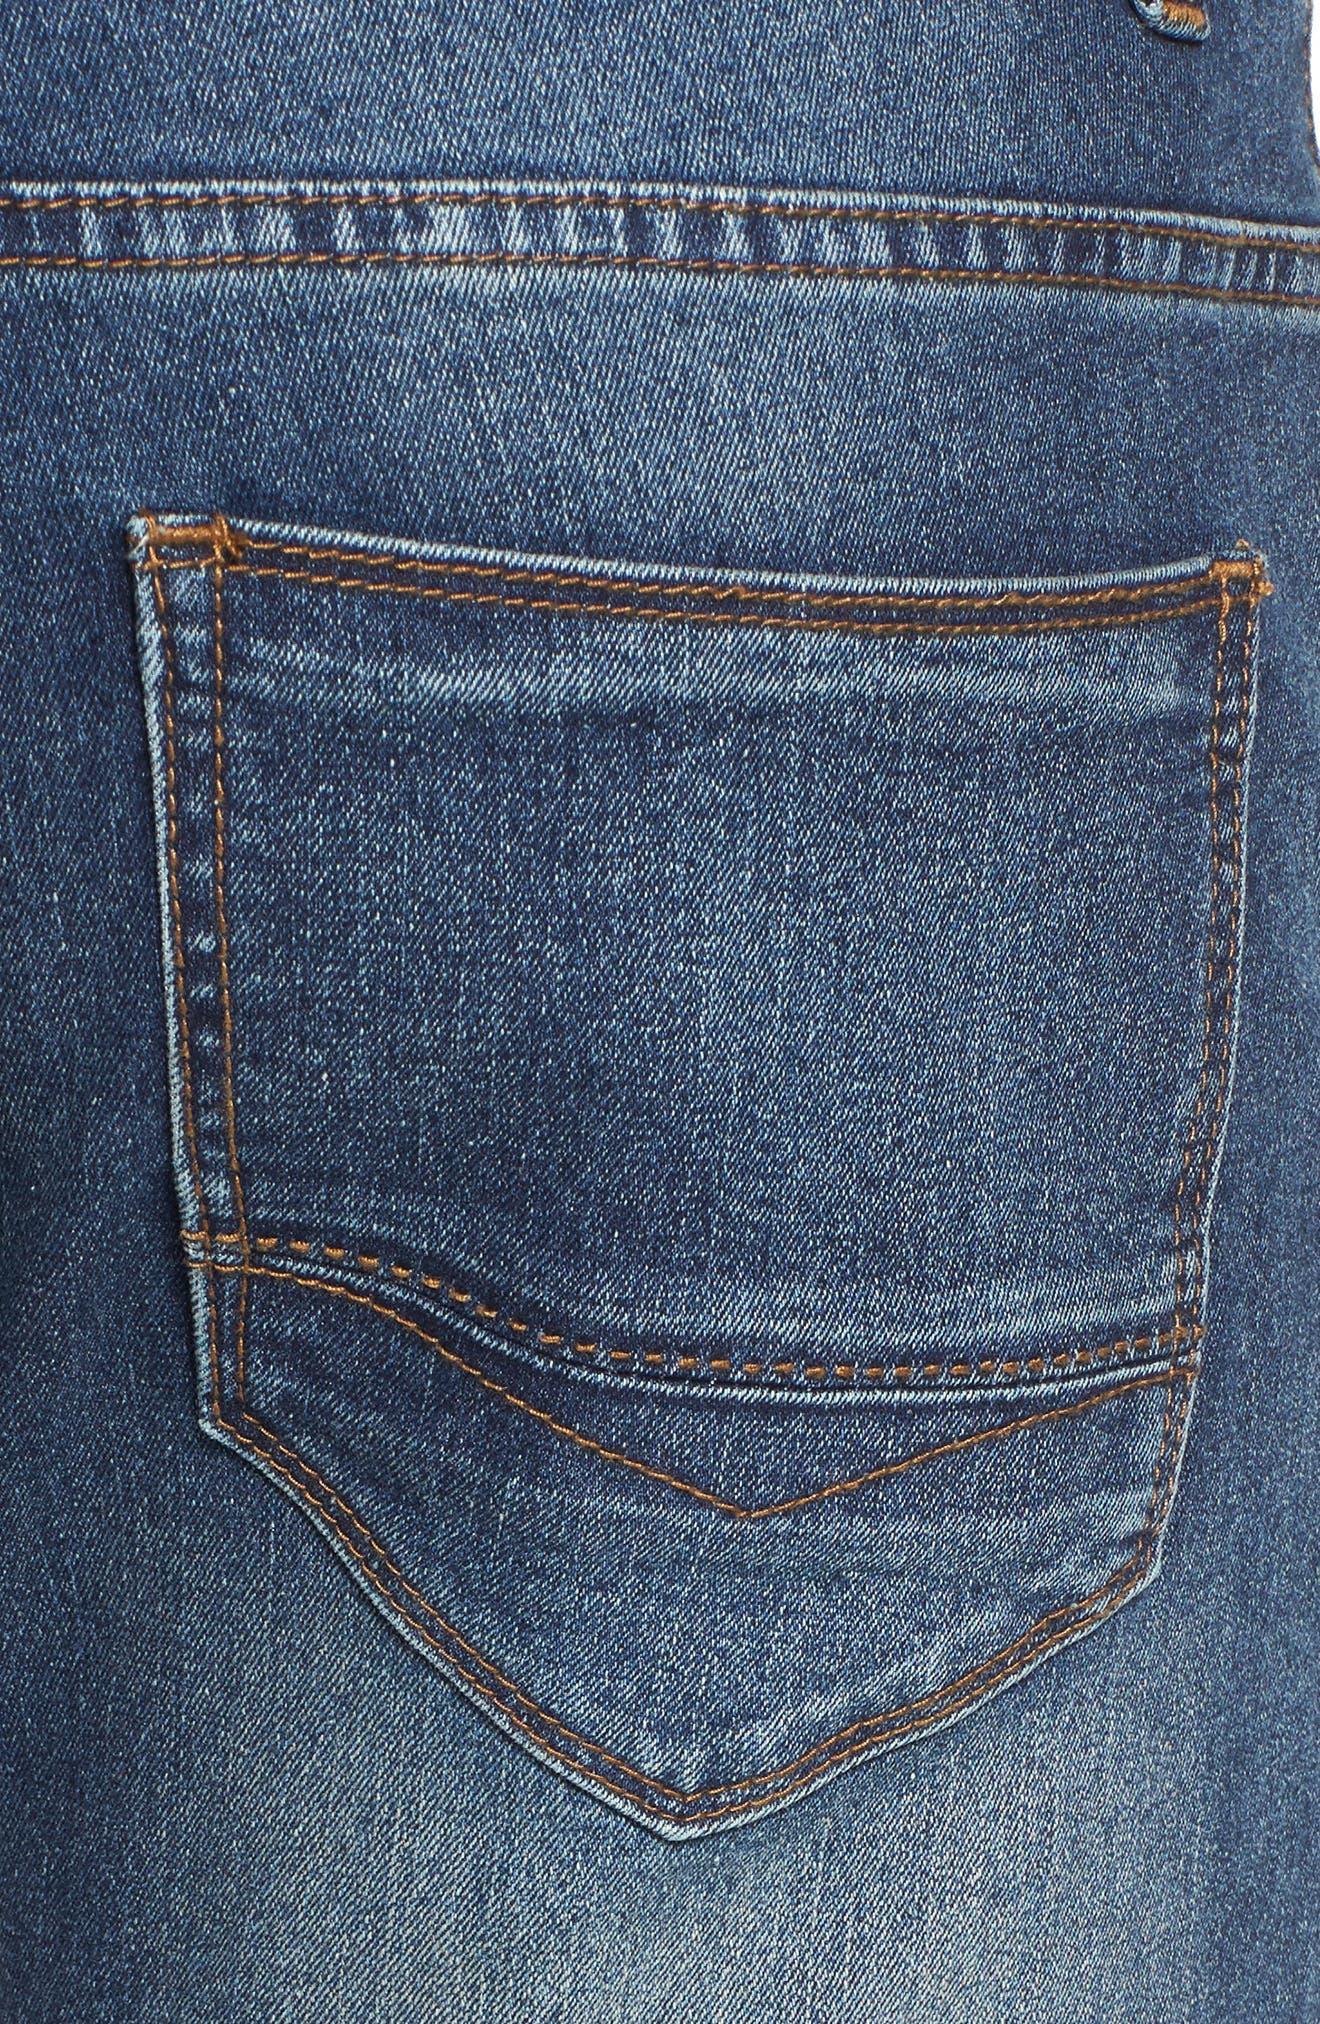 Maverick Stretch Slim Fit Jeans,                             Alternate thumbnail 5, color,                             MAVERICK WASH